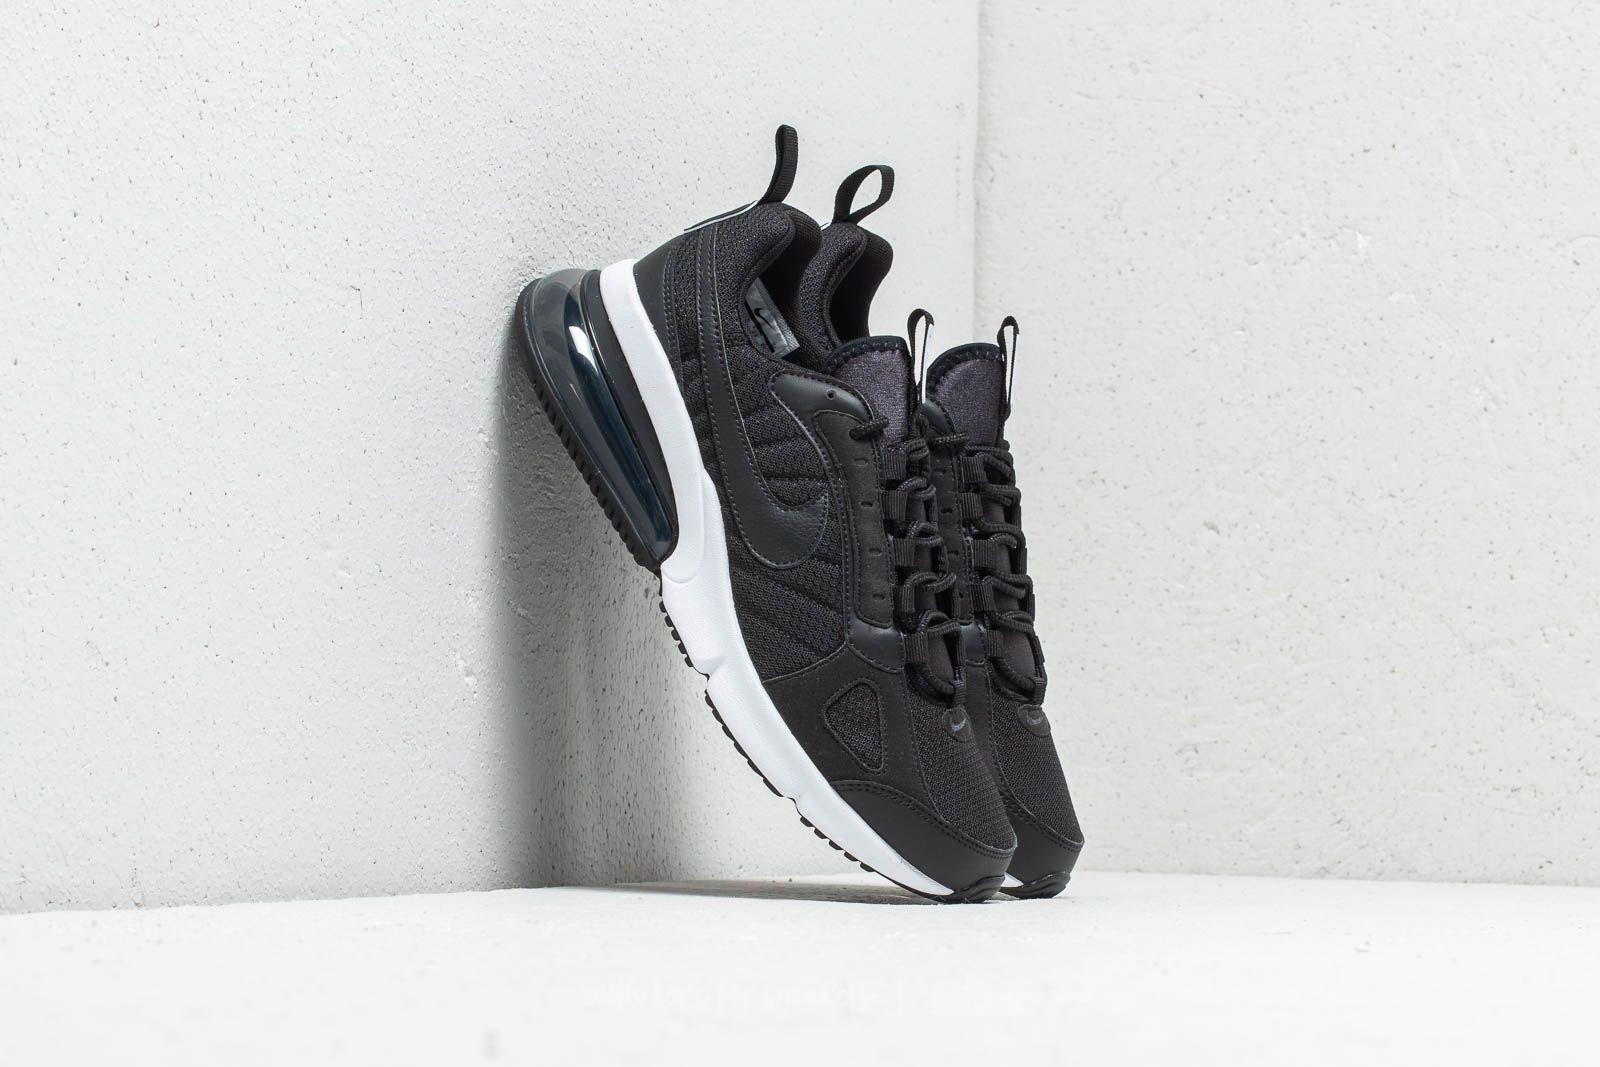 Nike Air Max 270 Futura Black/ Black-White za skvělou cenu 3 790 Kč koupíte na Footshop.cz